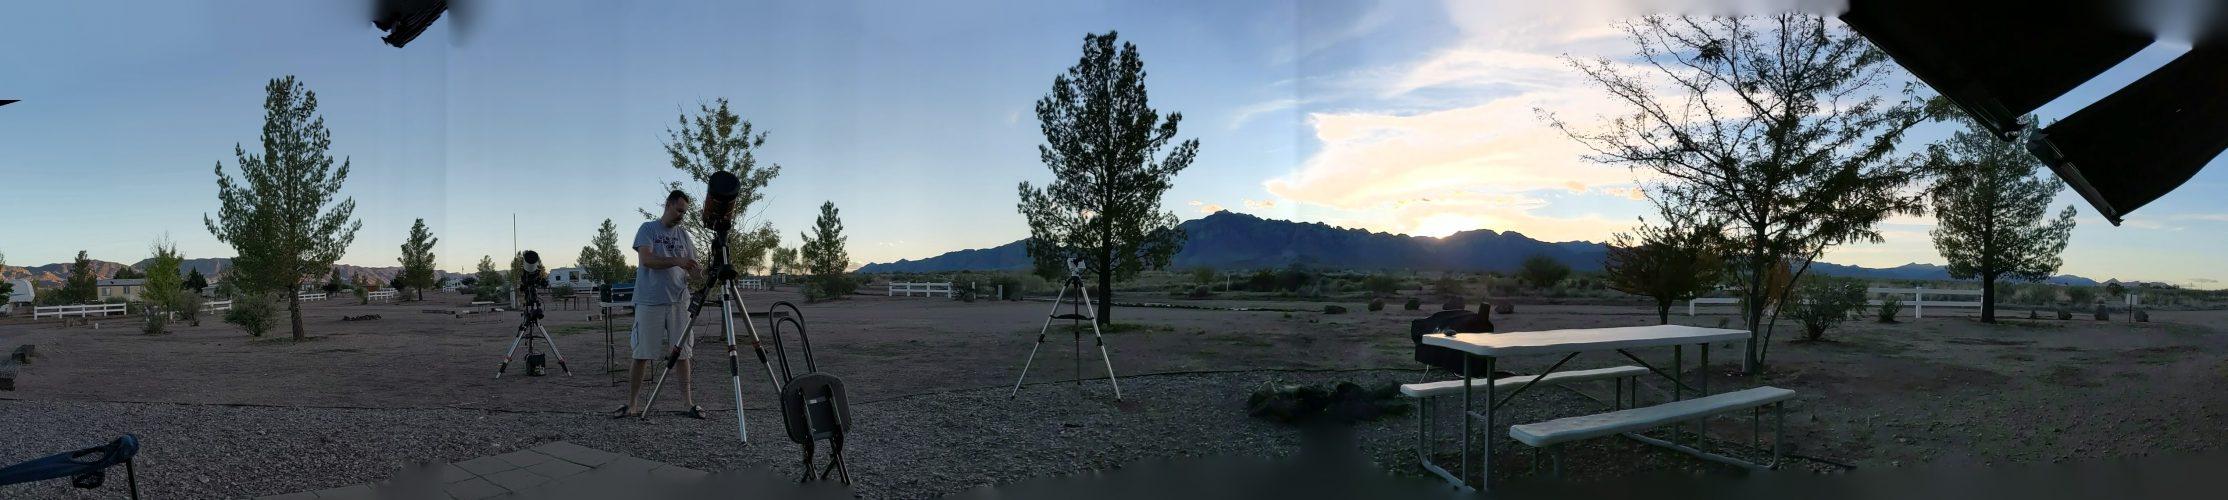 Rusty's RV Ranch